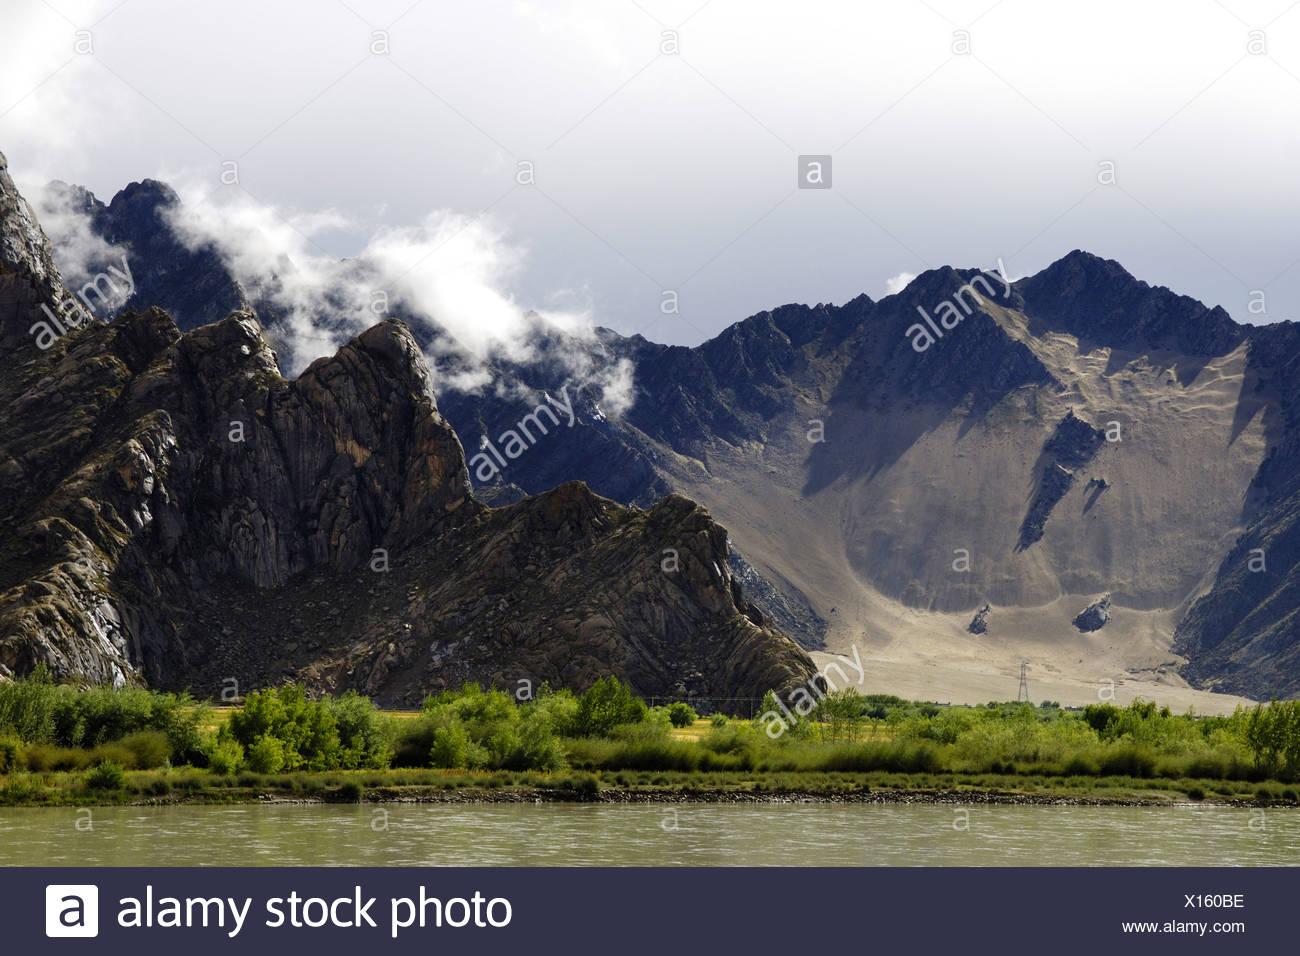 Mountain scape, Brahmaputra River, Lhasa, Tibet, Asia - Stock Image